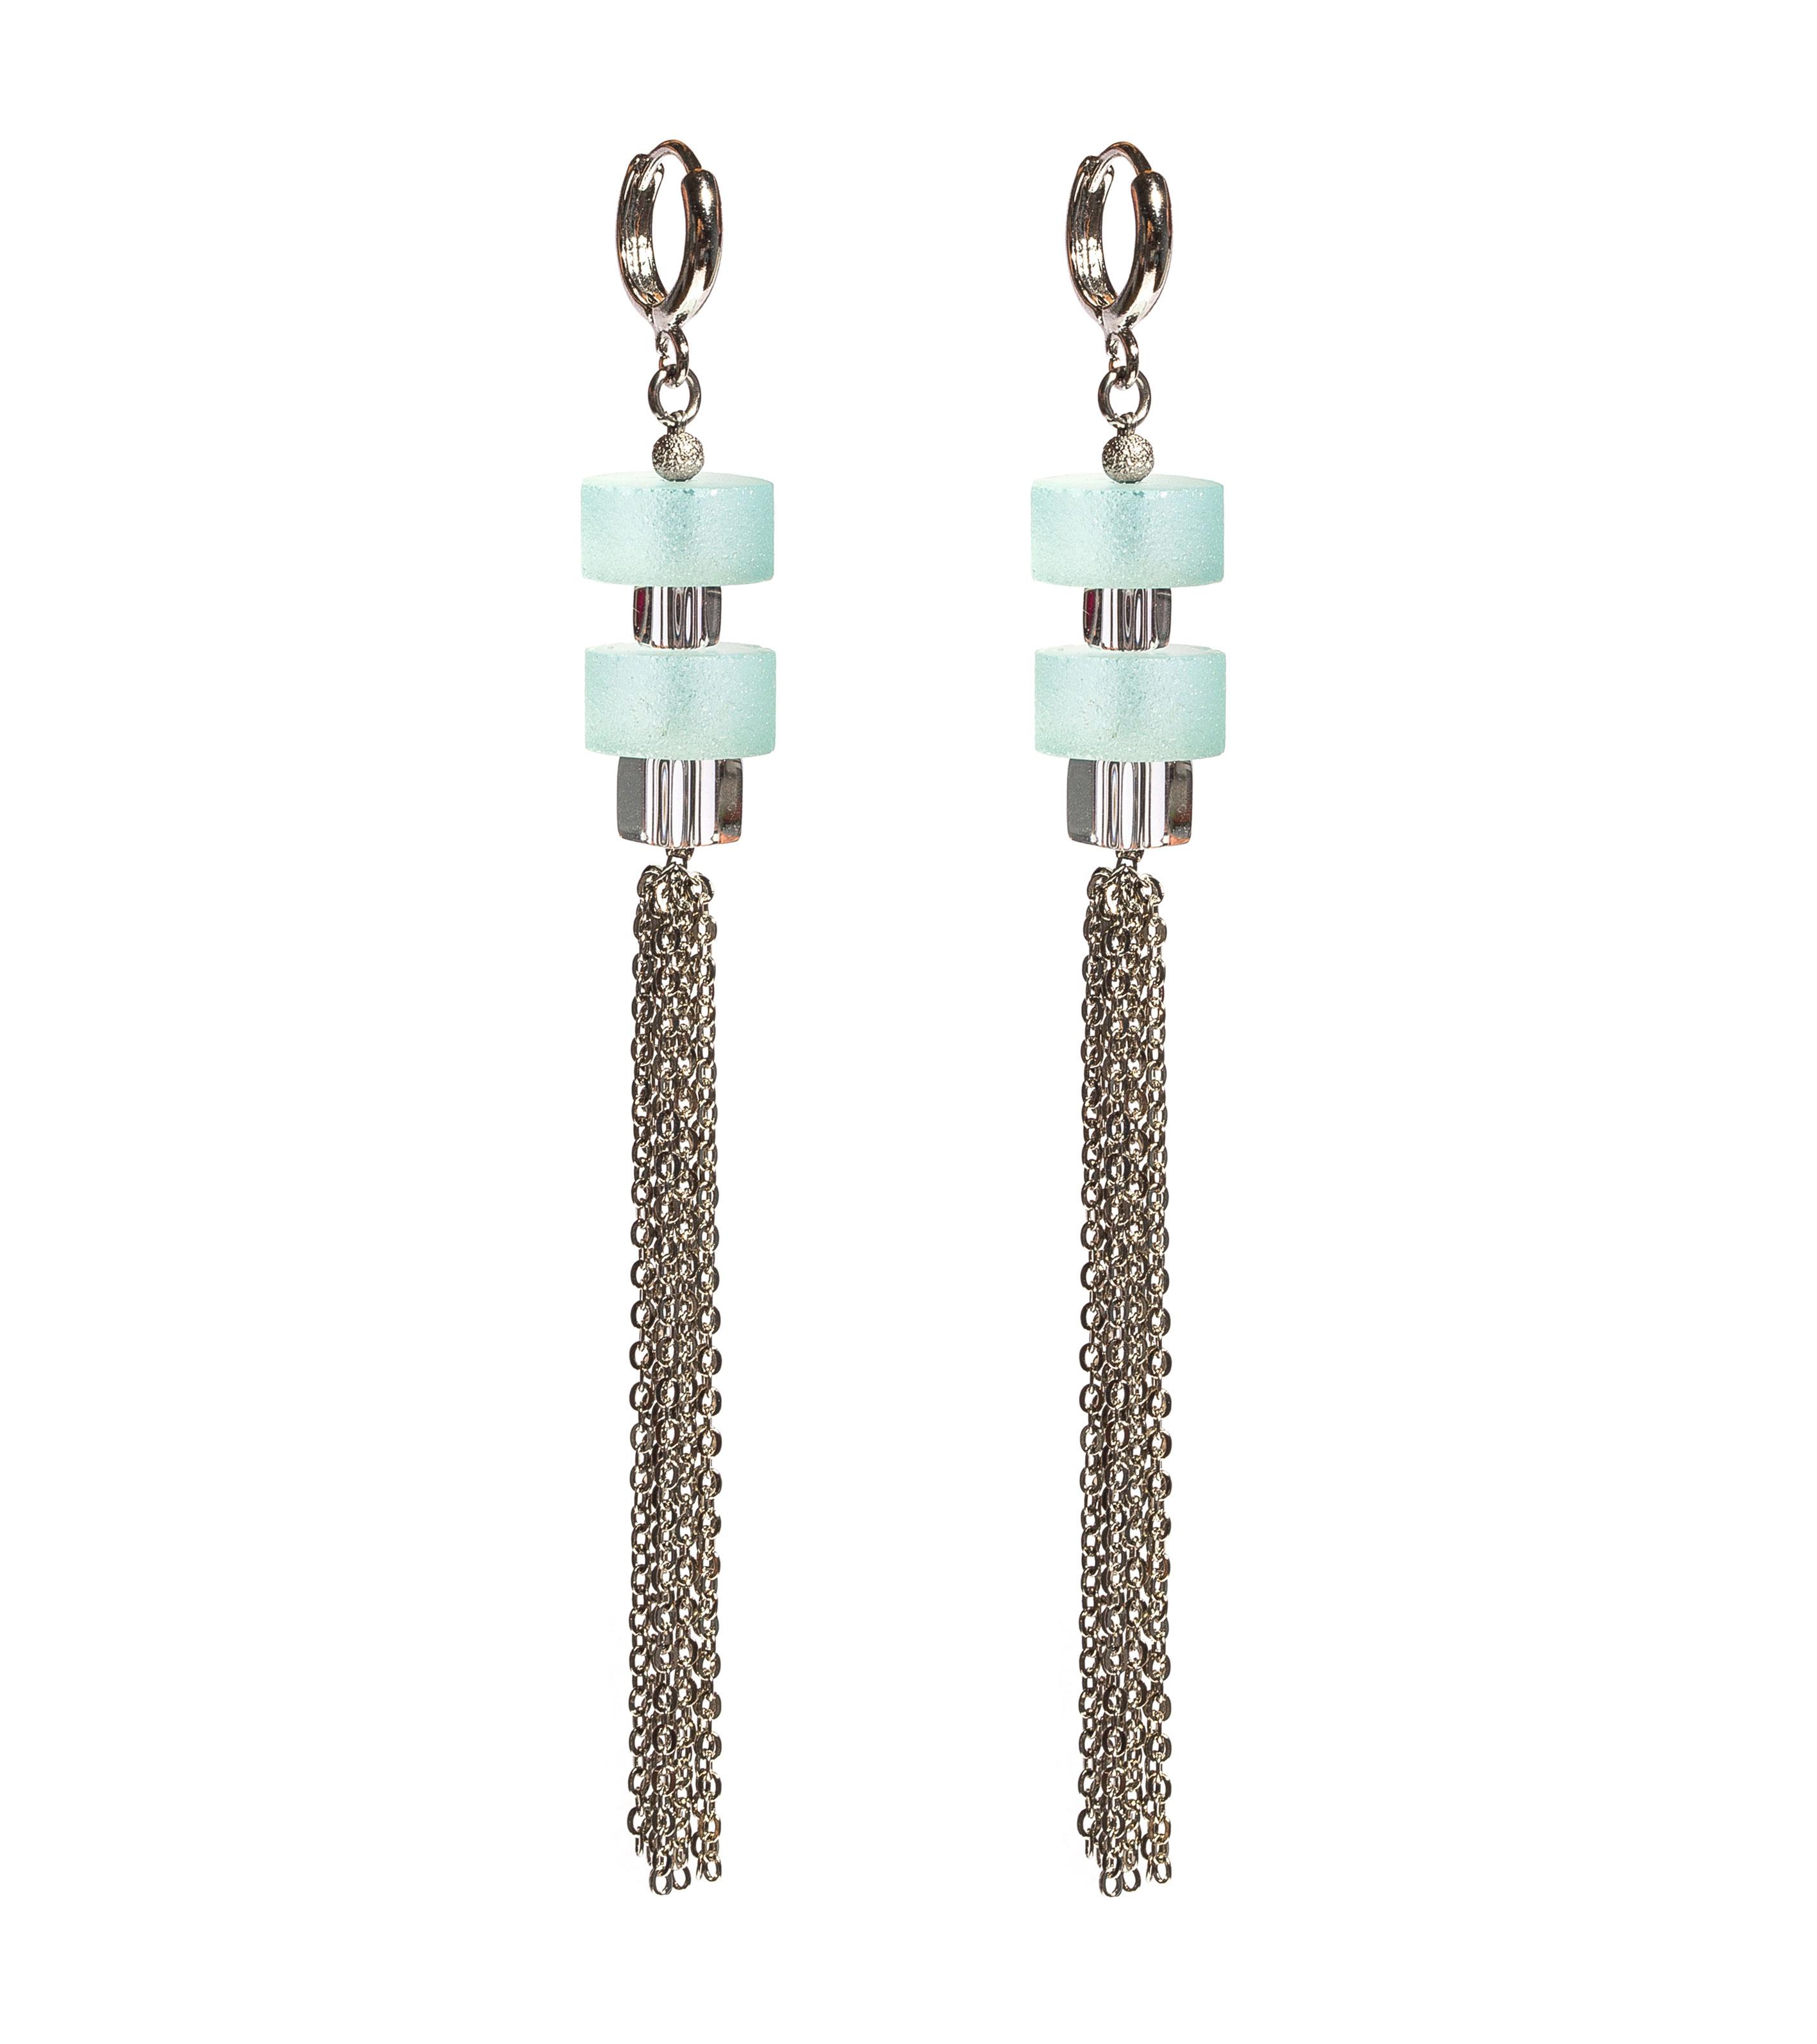 004-chloe-earrings-golovina-accessories-01